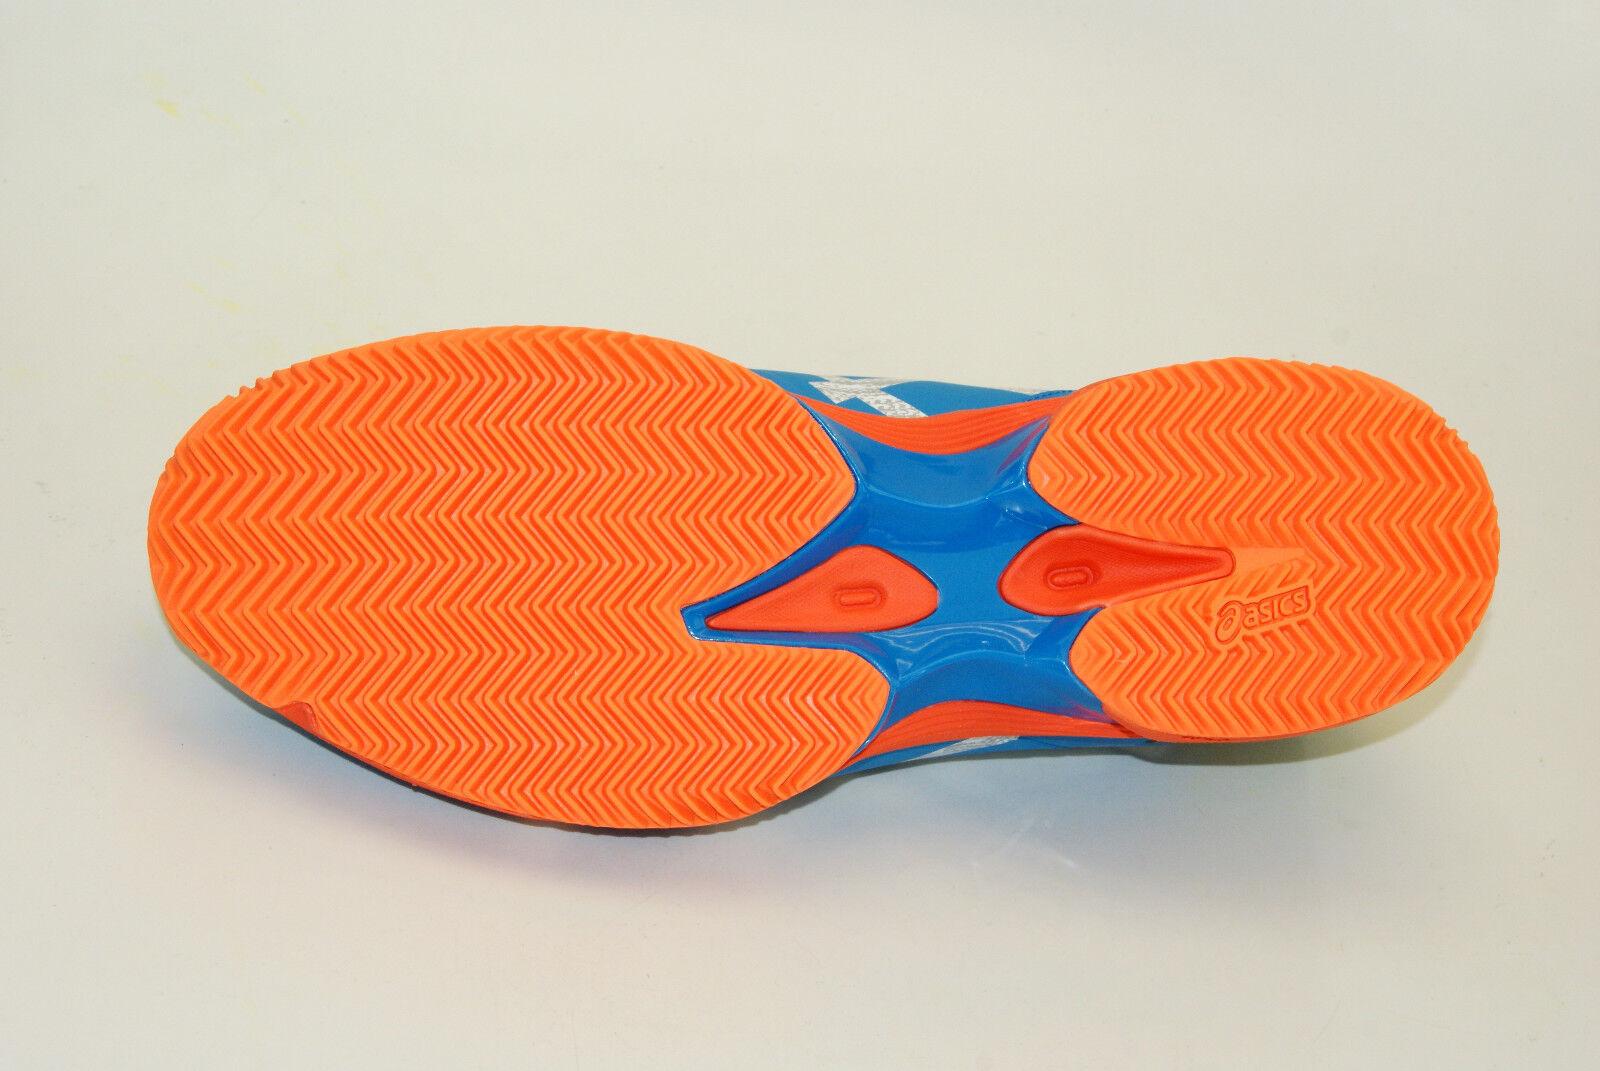 Asics padelschuhe gel-lima padelschuhe Asics Zapatillas de deporte los zapatos del Hombres 02dc9c